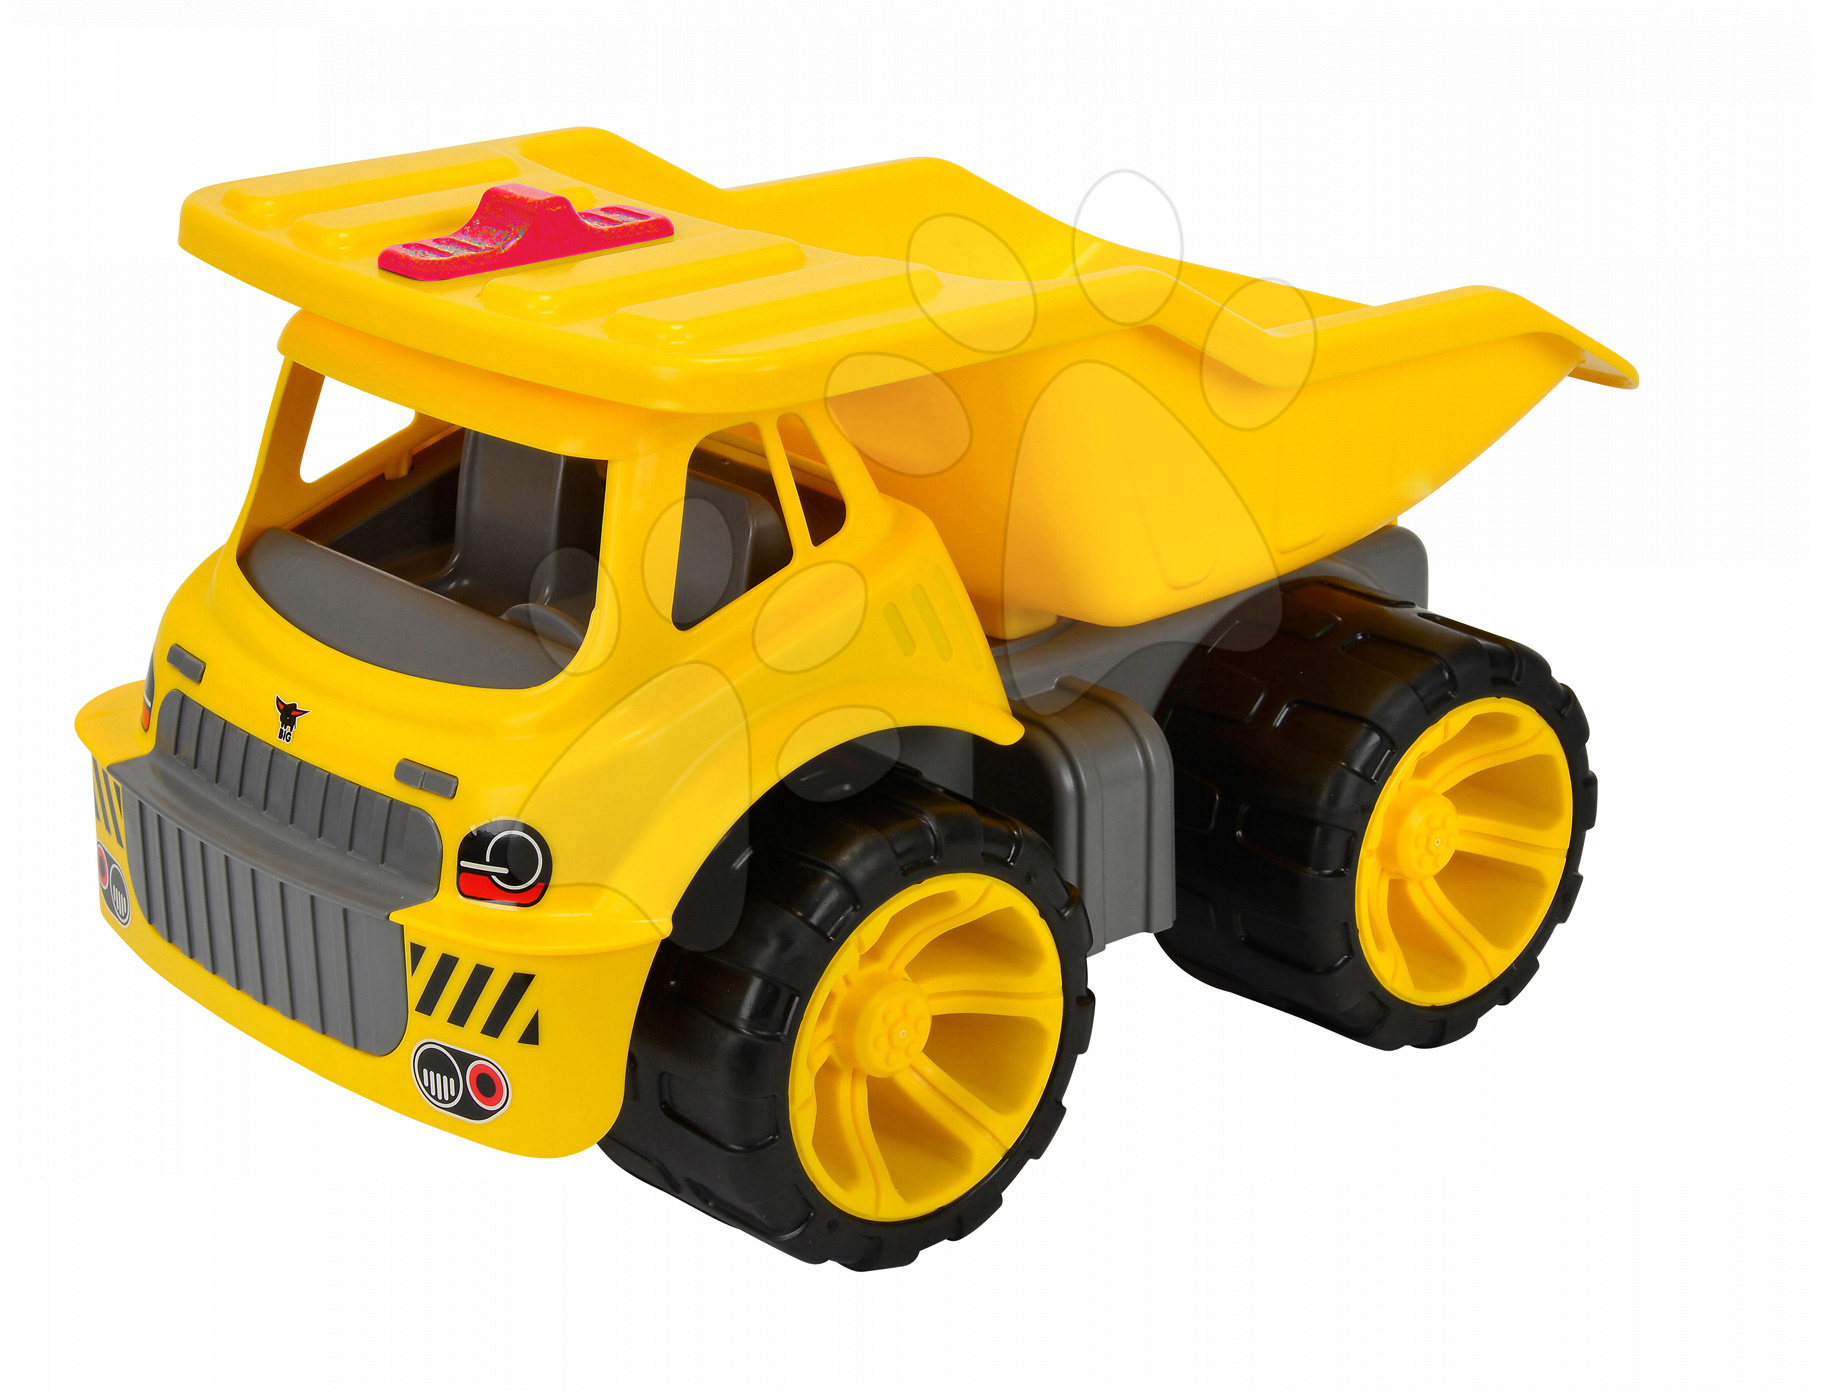 Nákladné autá - Nákladné auto Maxi Power BIG dĺžka 46 cm žlté od 24 mes